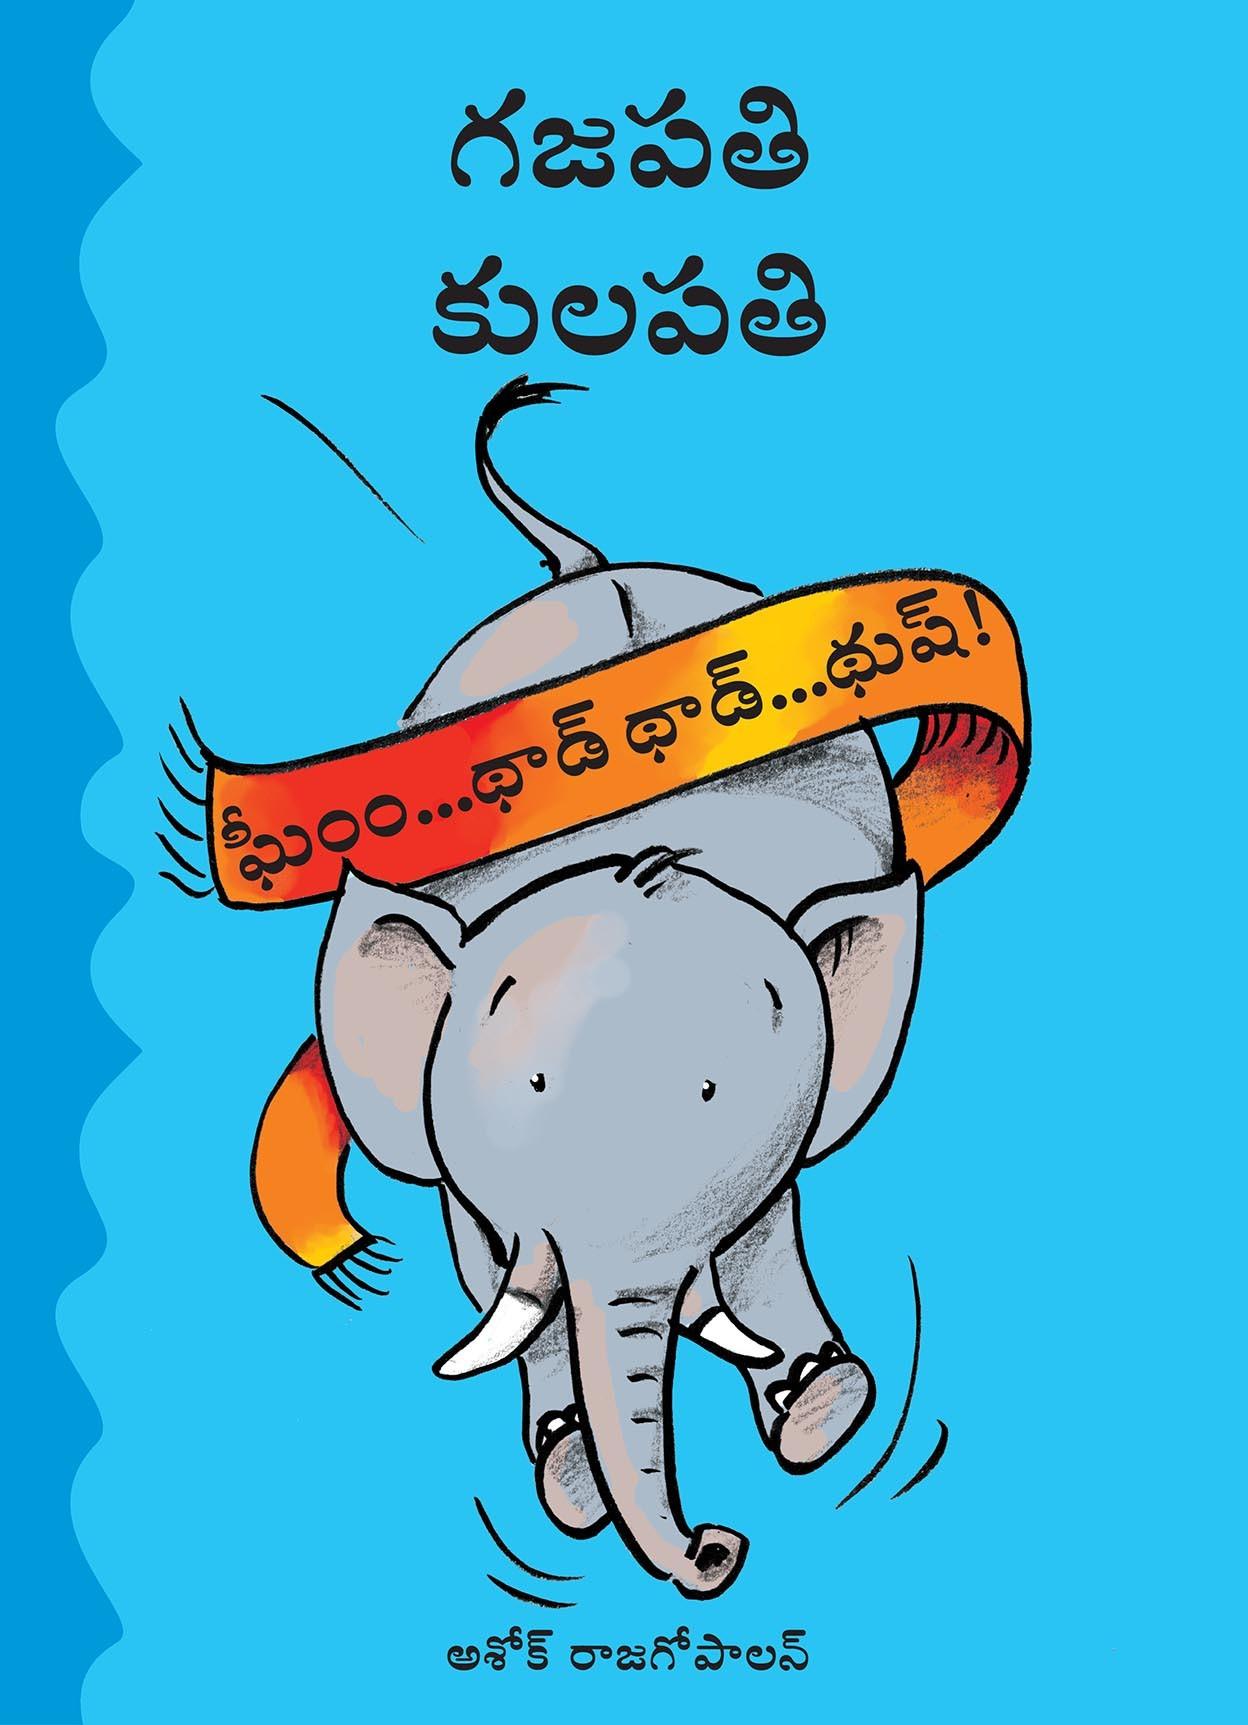 Gajapati Kulapati Kalabalooosh/Gajapati Kulapati-Gheem…Thad Thad…Thussh! (Telugu)